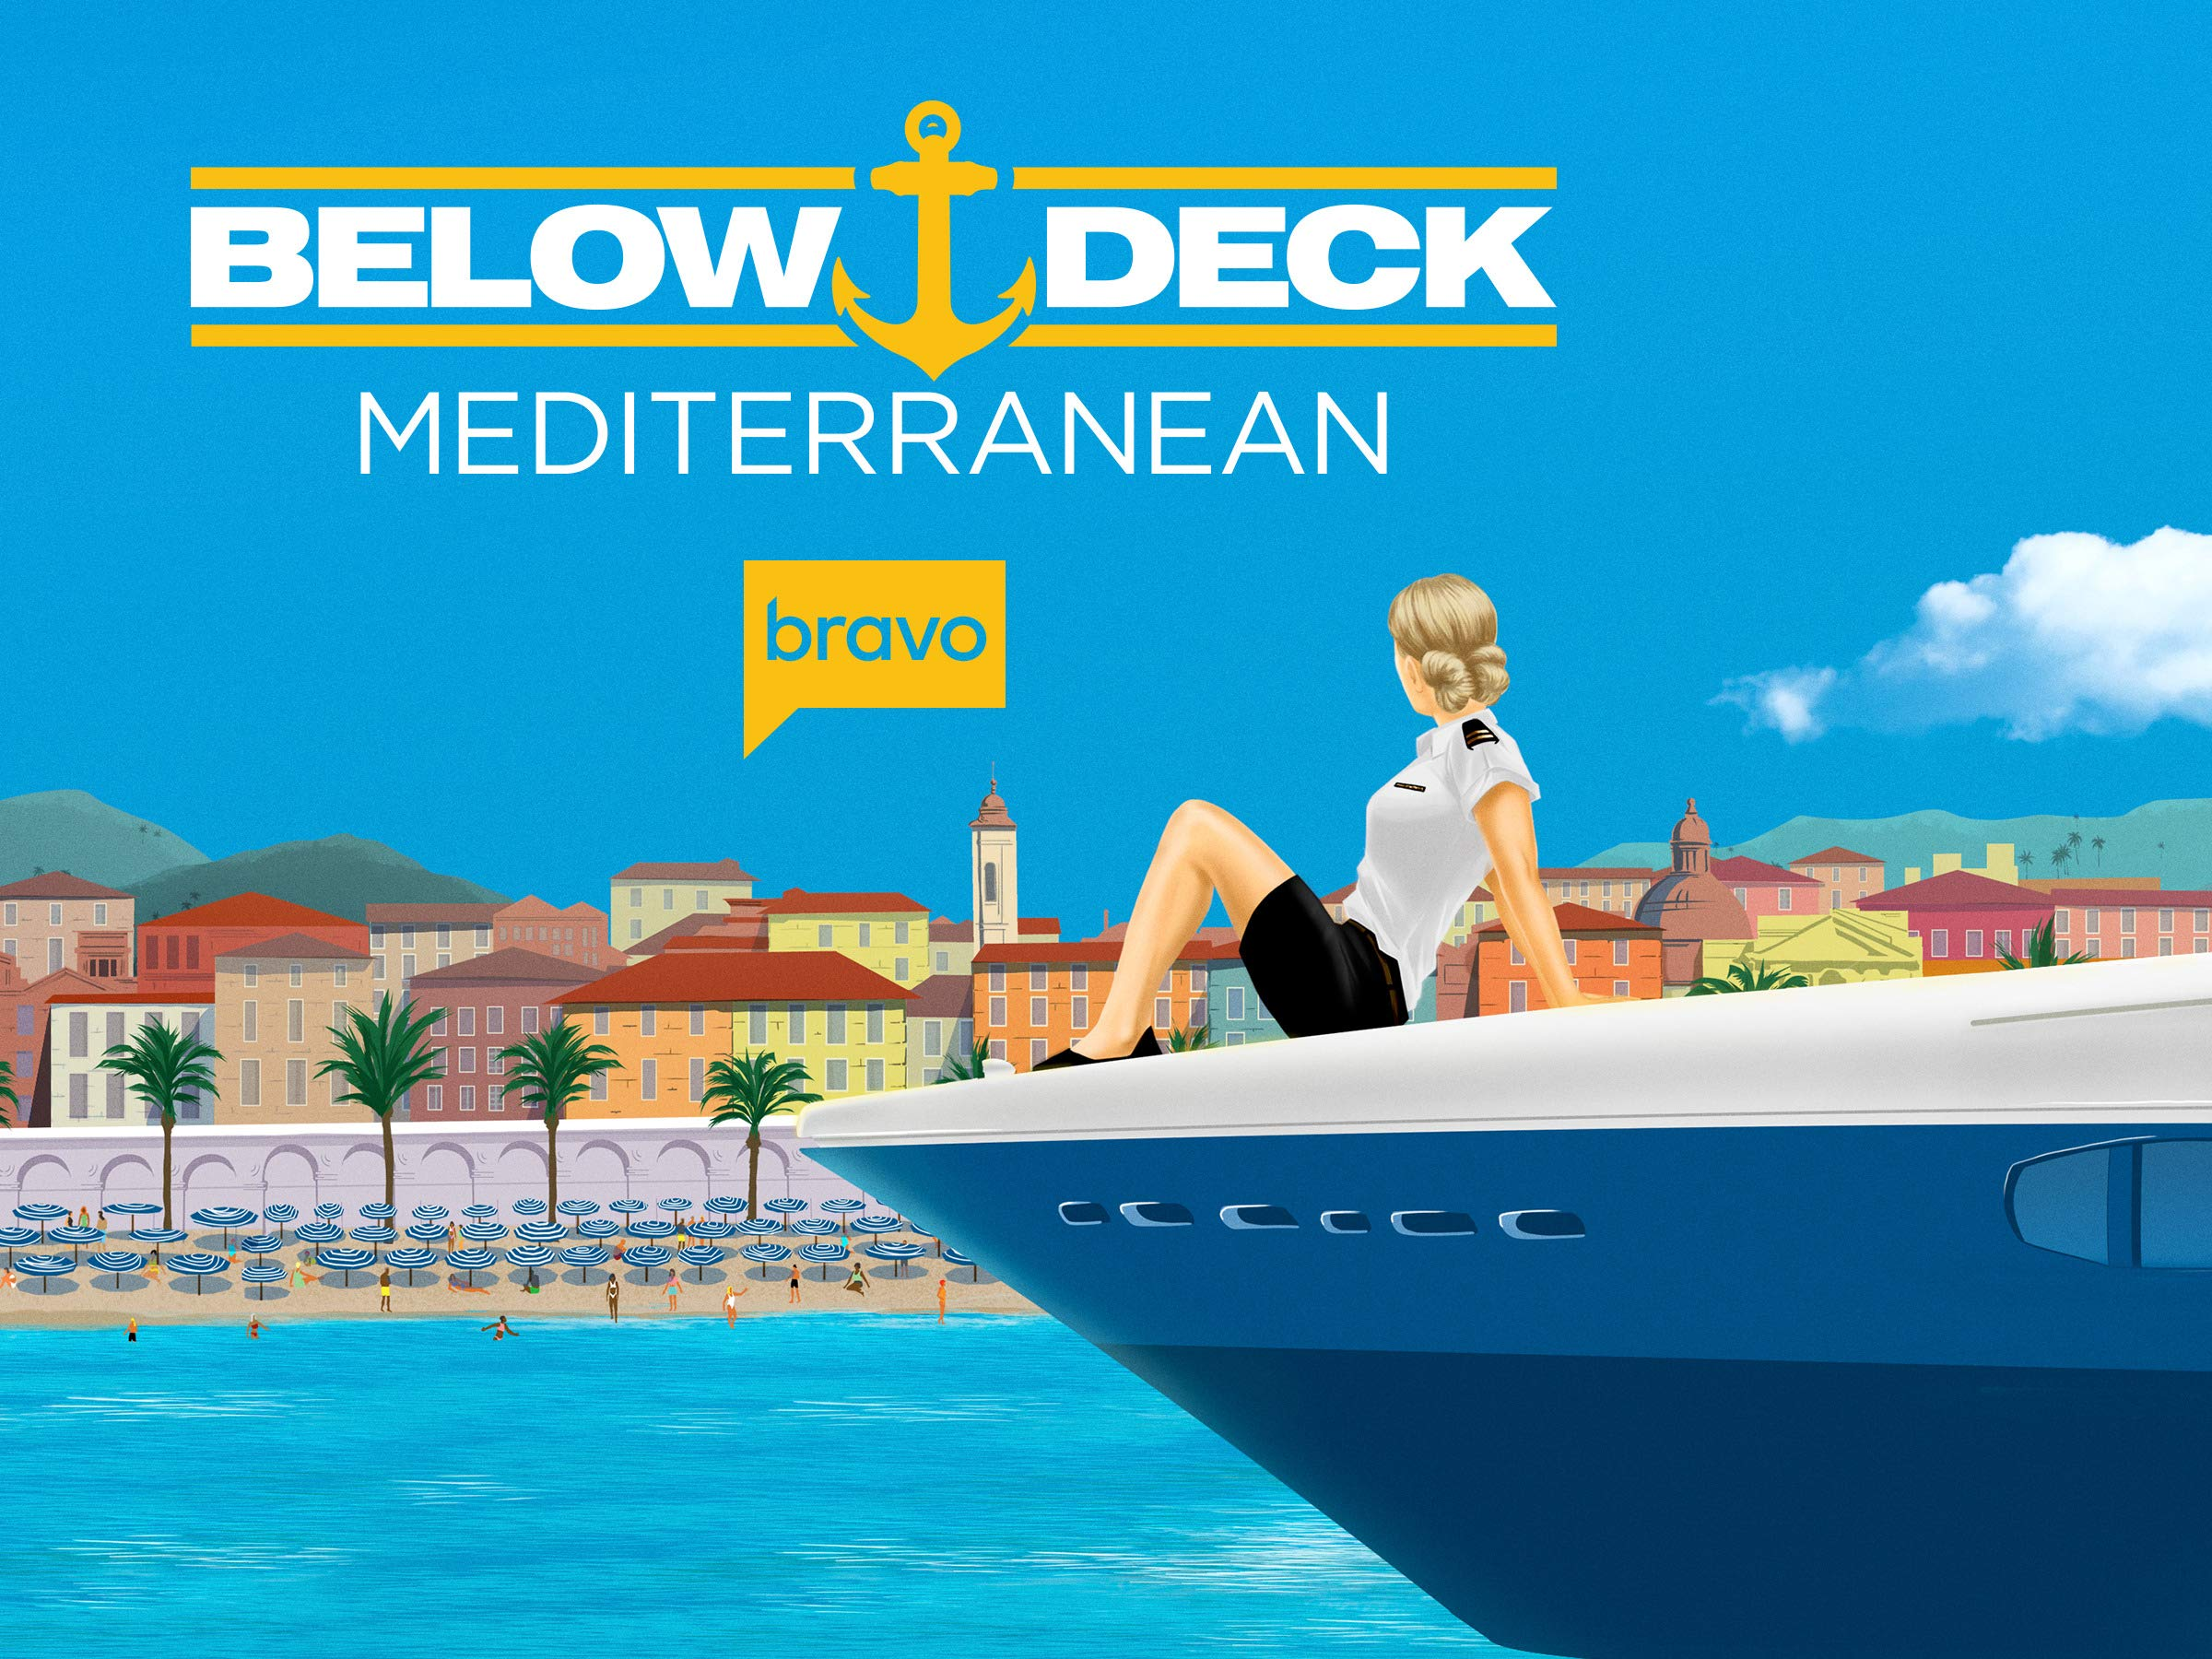 Below Deck Mediterranean Season 4 on sale